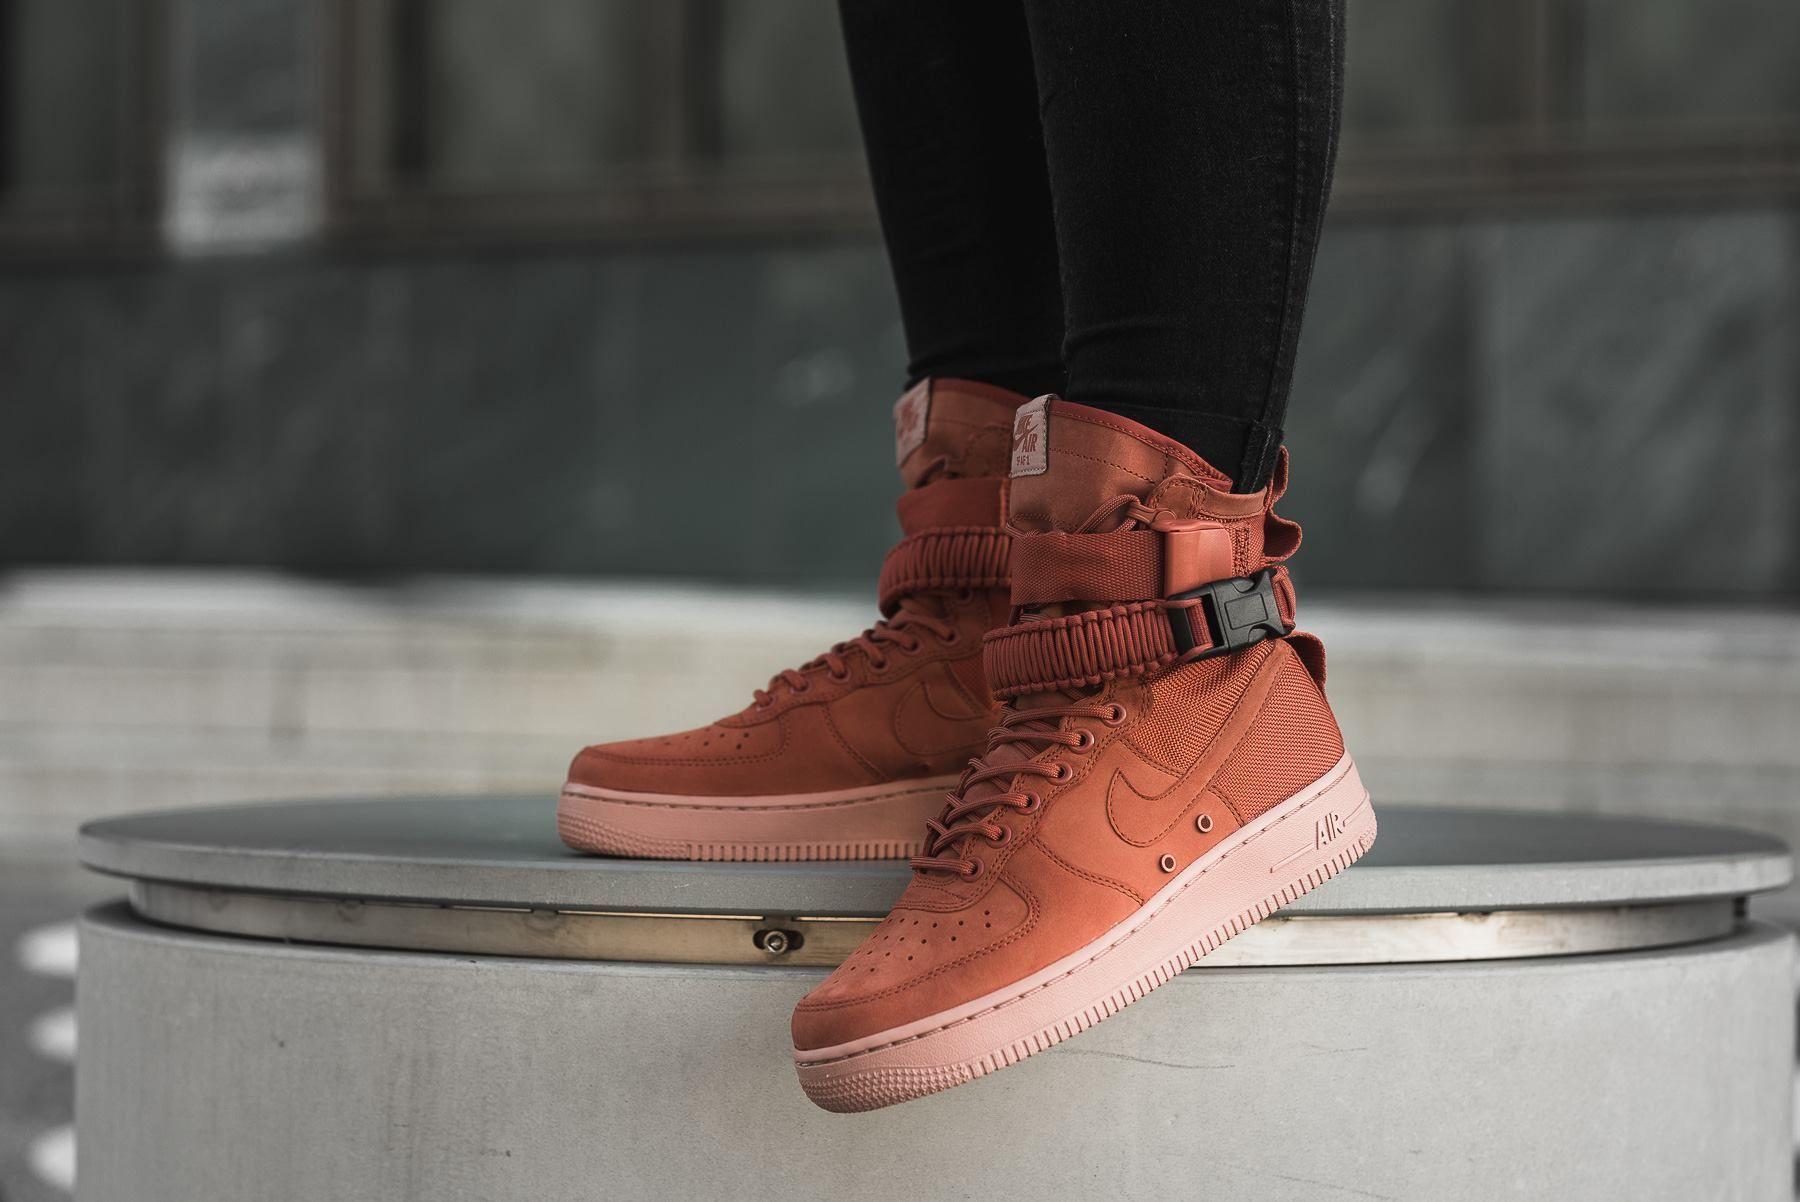 Nike Sf Air Force 1 Dusty Peach Grailify Sneaker Releases Nike Nice Shoes Sneaker Head